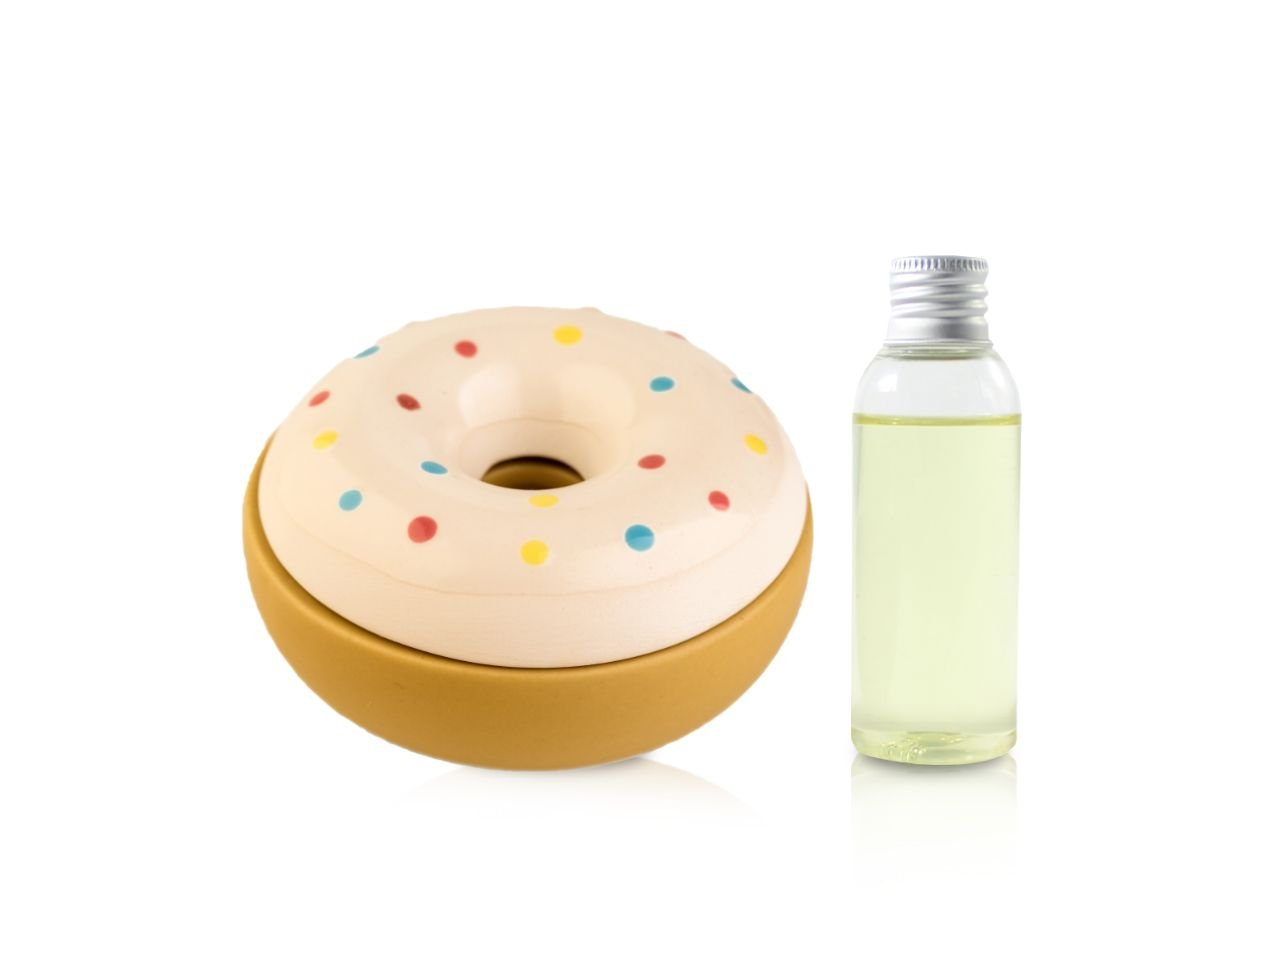 Diffusore Ambiente Donuts Bianco 50 Ml - v1